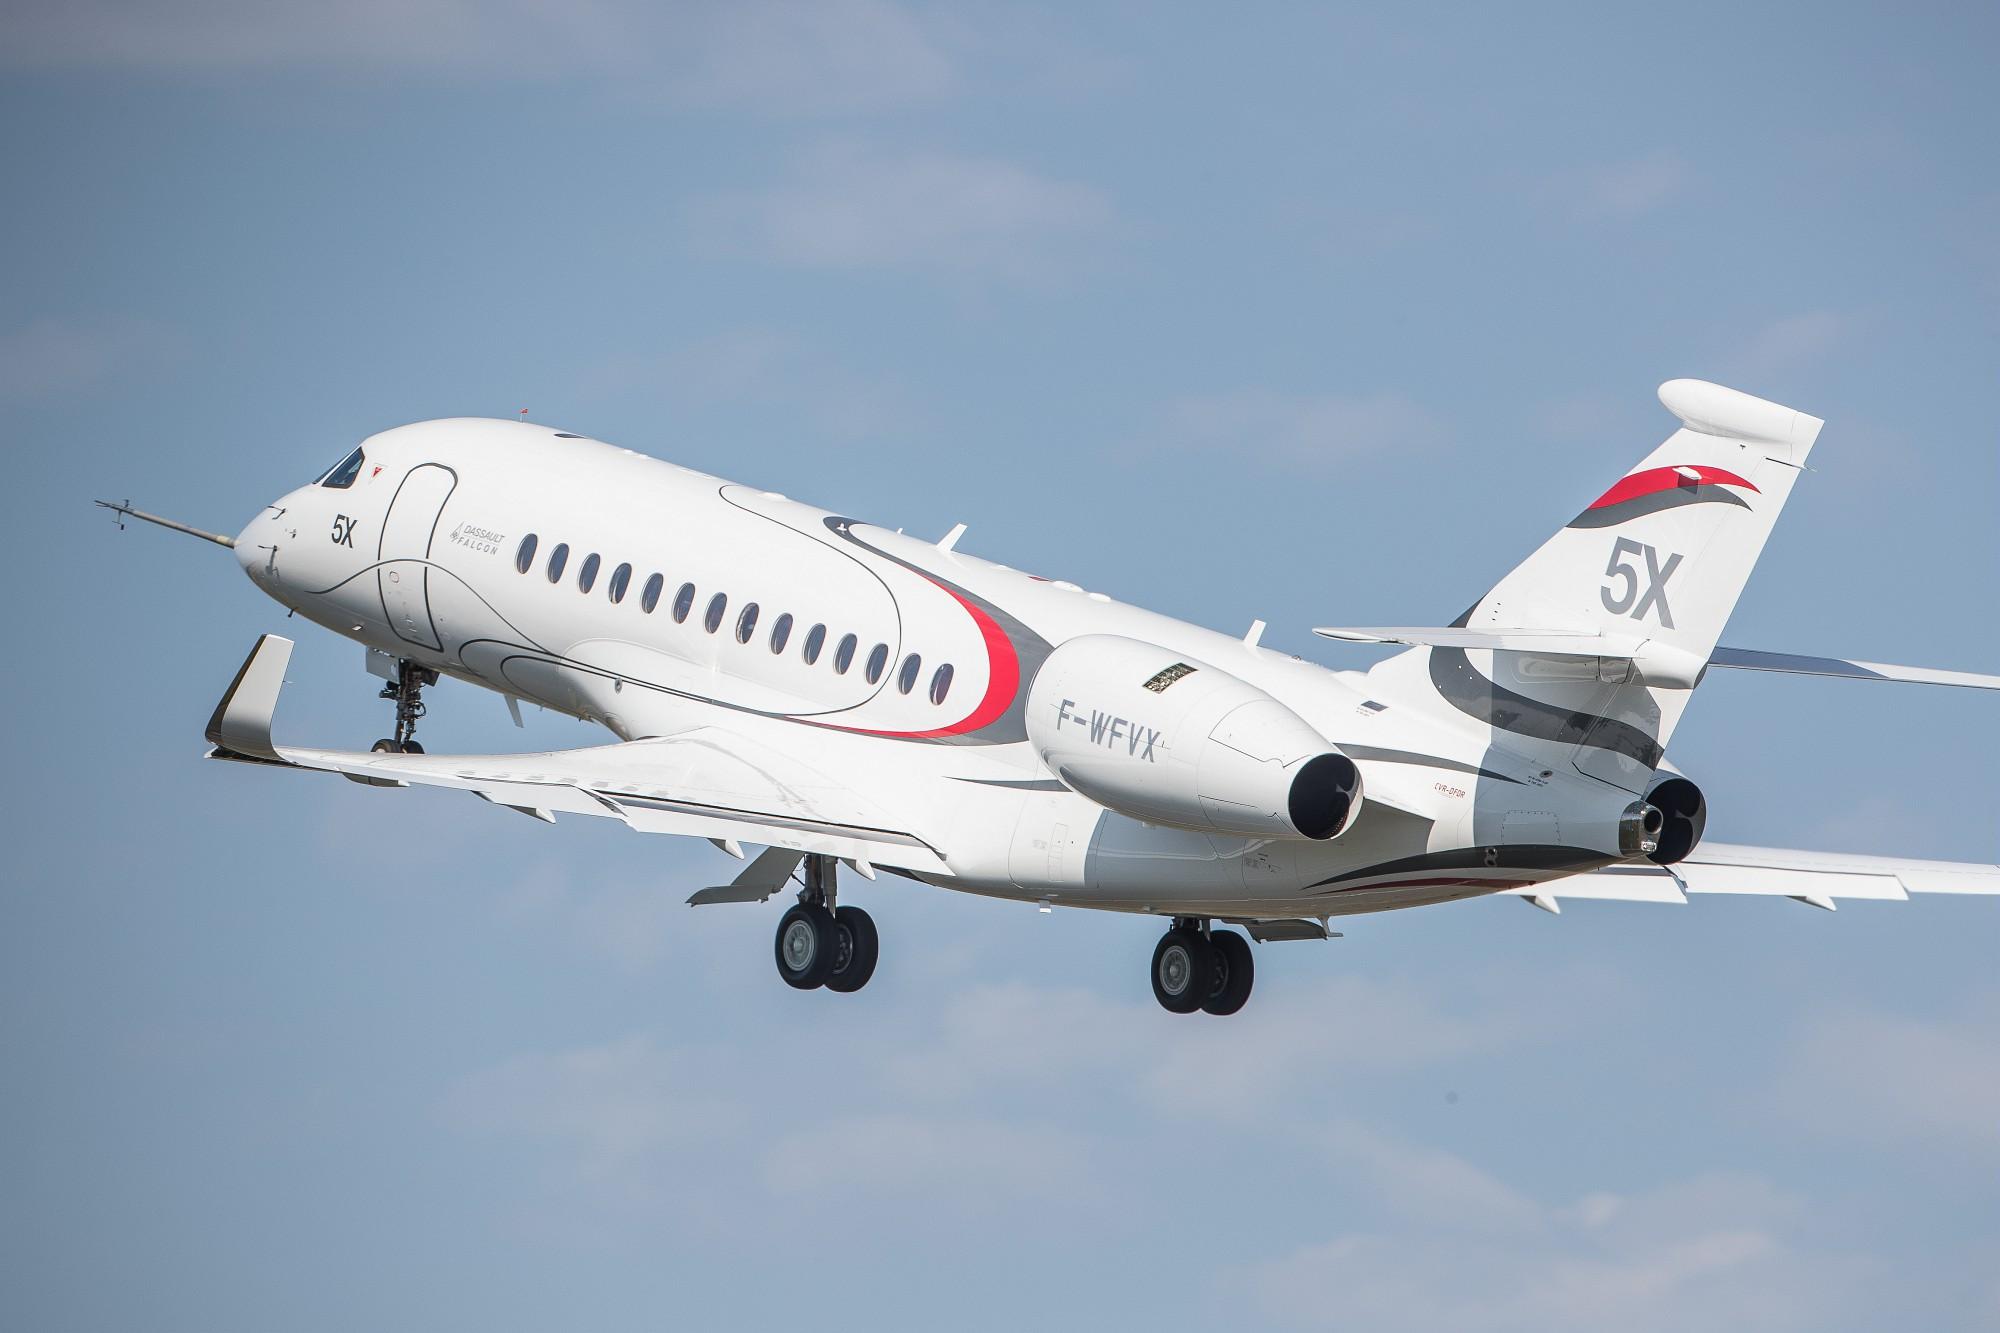 Dassault Falcon 5X in flight